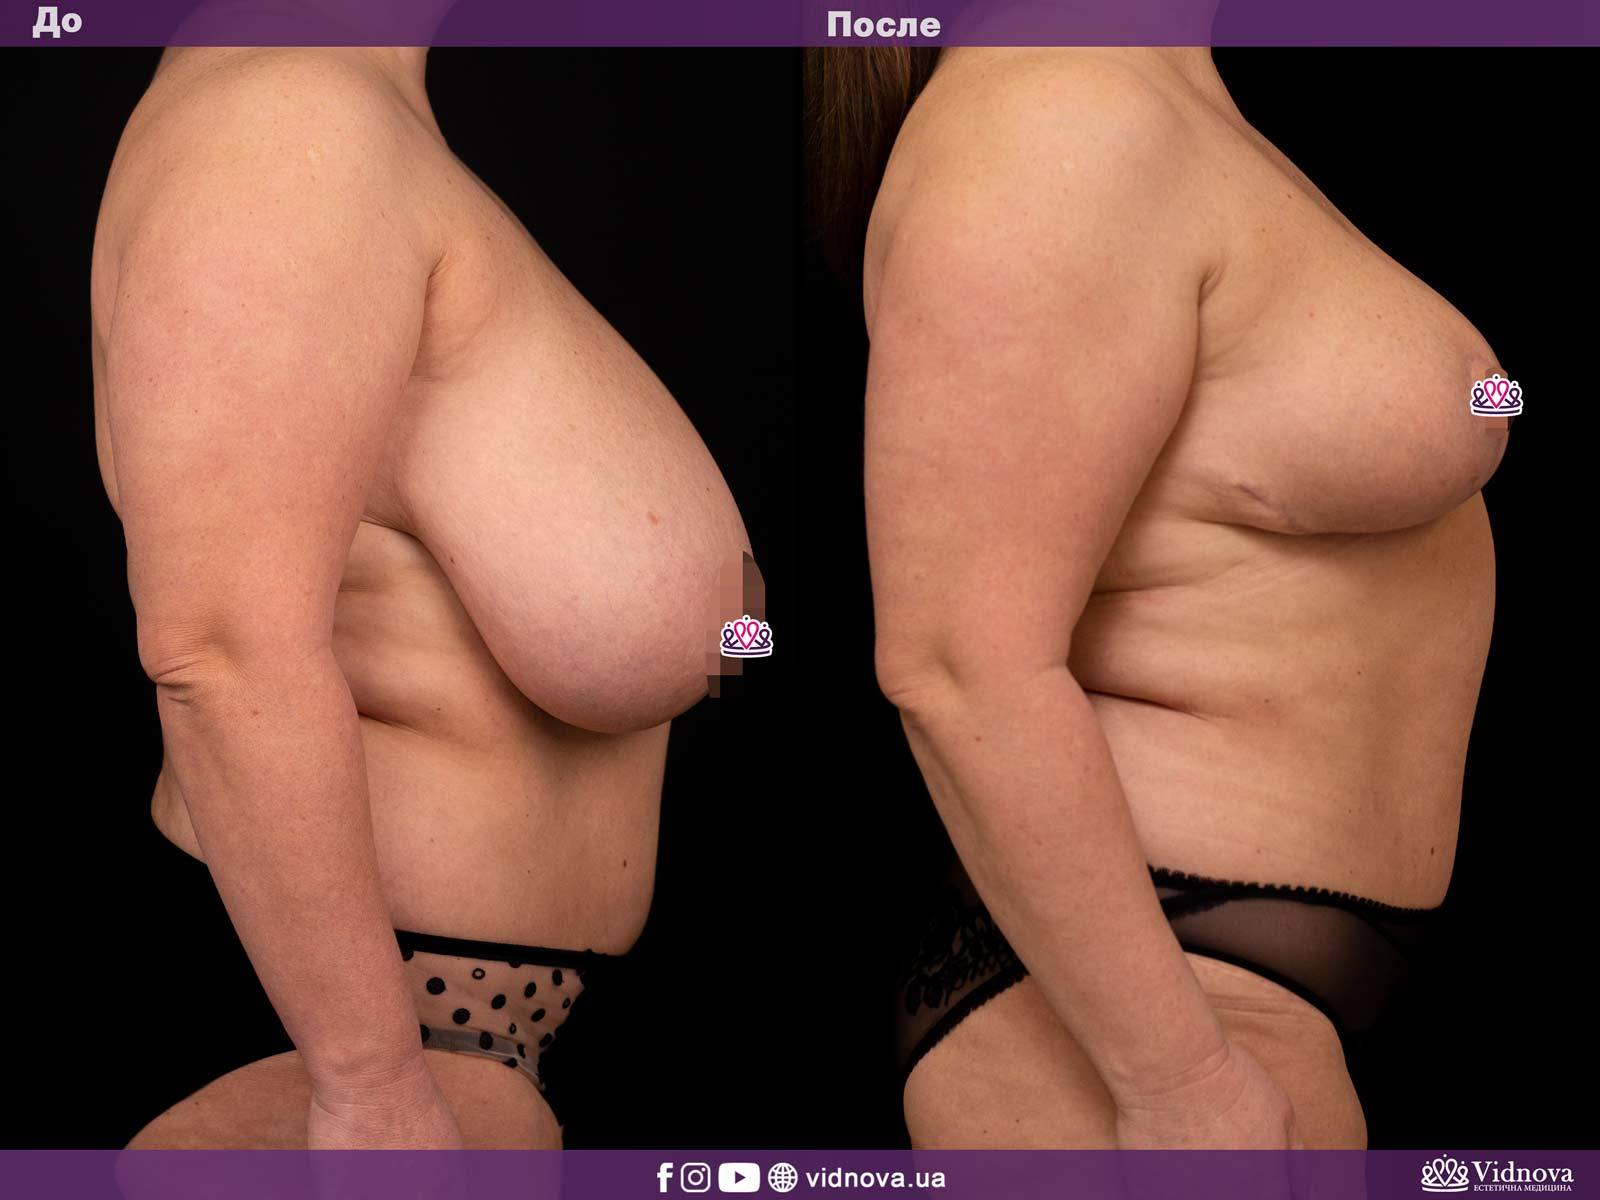 Уменьшение груди: Фото ДО и ПОСЛЕ - Пример №2-3 - Клиника Vidnova